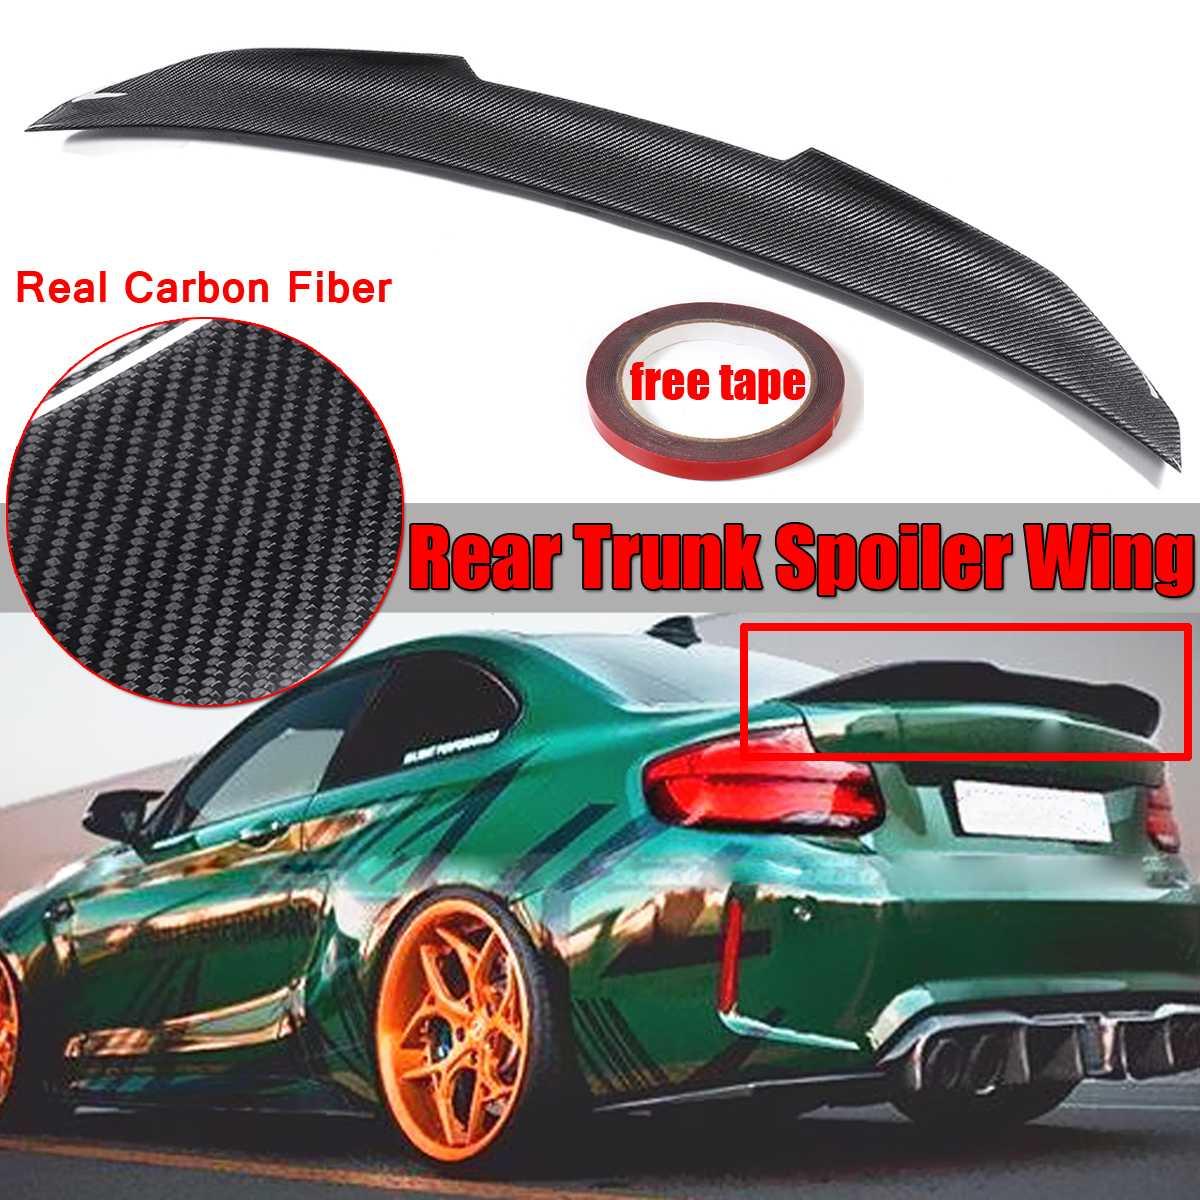 High Quality Real Carbon Fiber For BMW F22 M235i F87 M2 2014 2018 Car Trunk Spoiler